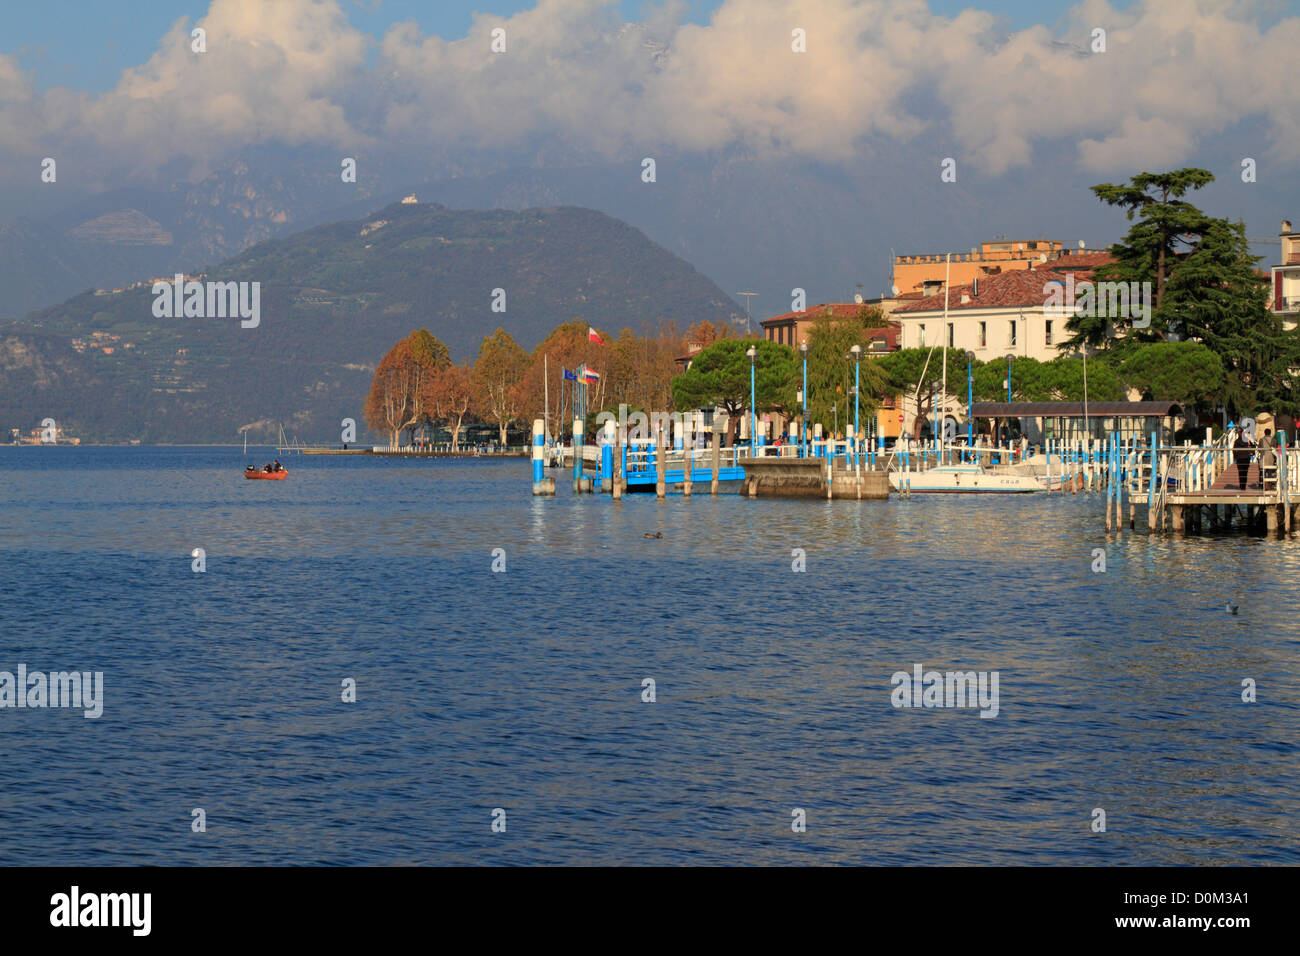 Harbour on Lake Iseo near Bergamo, Lombardy, Italy, Europe. - Stock Image